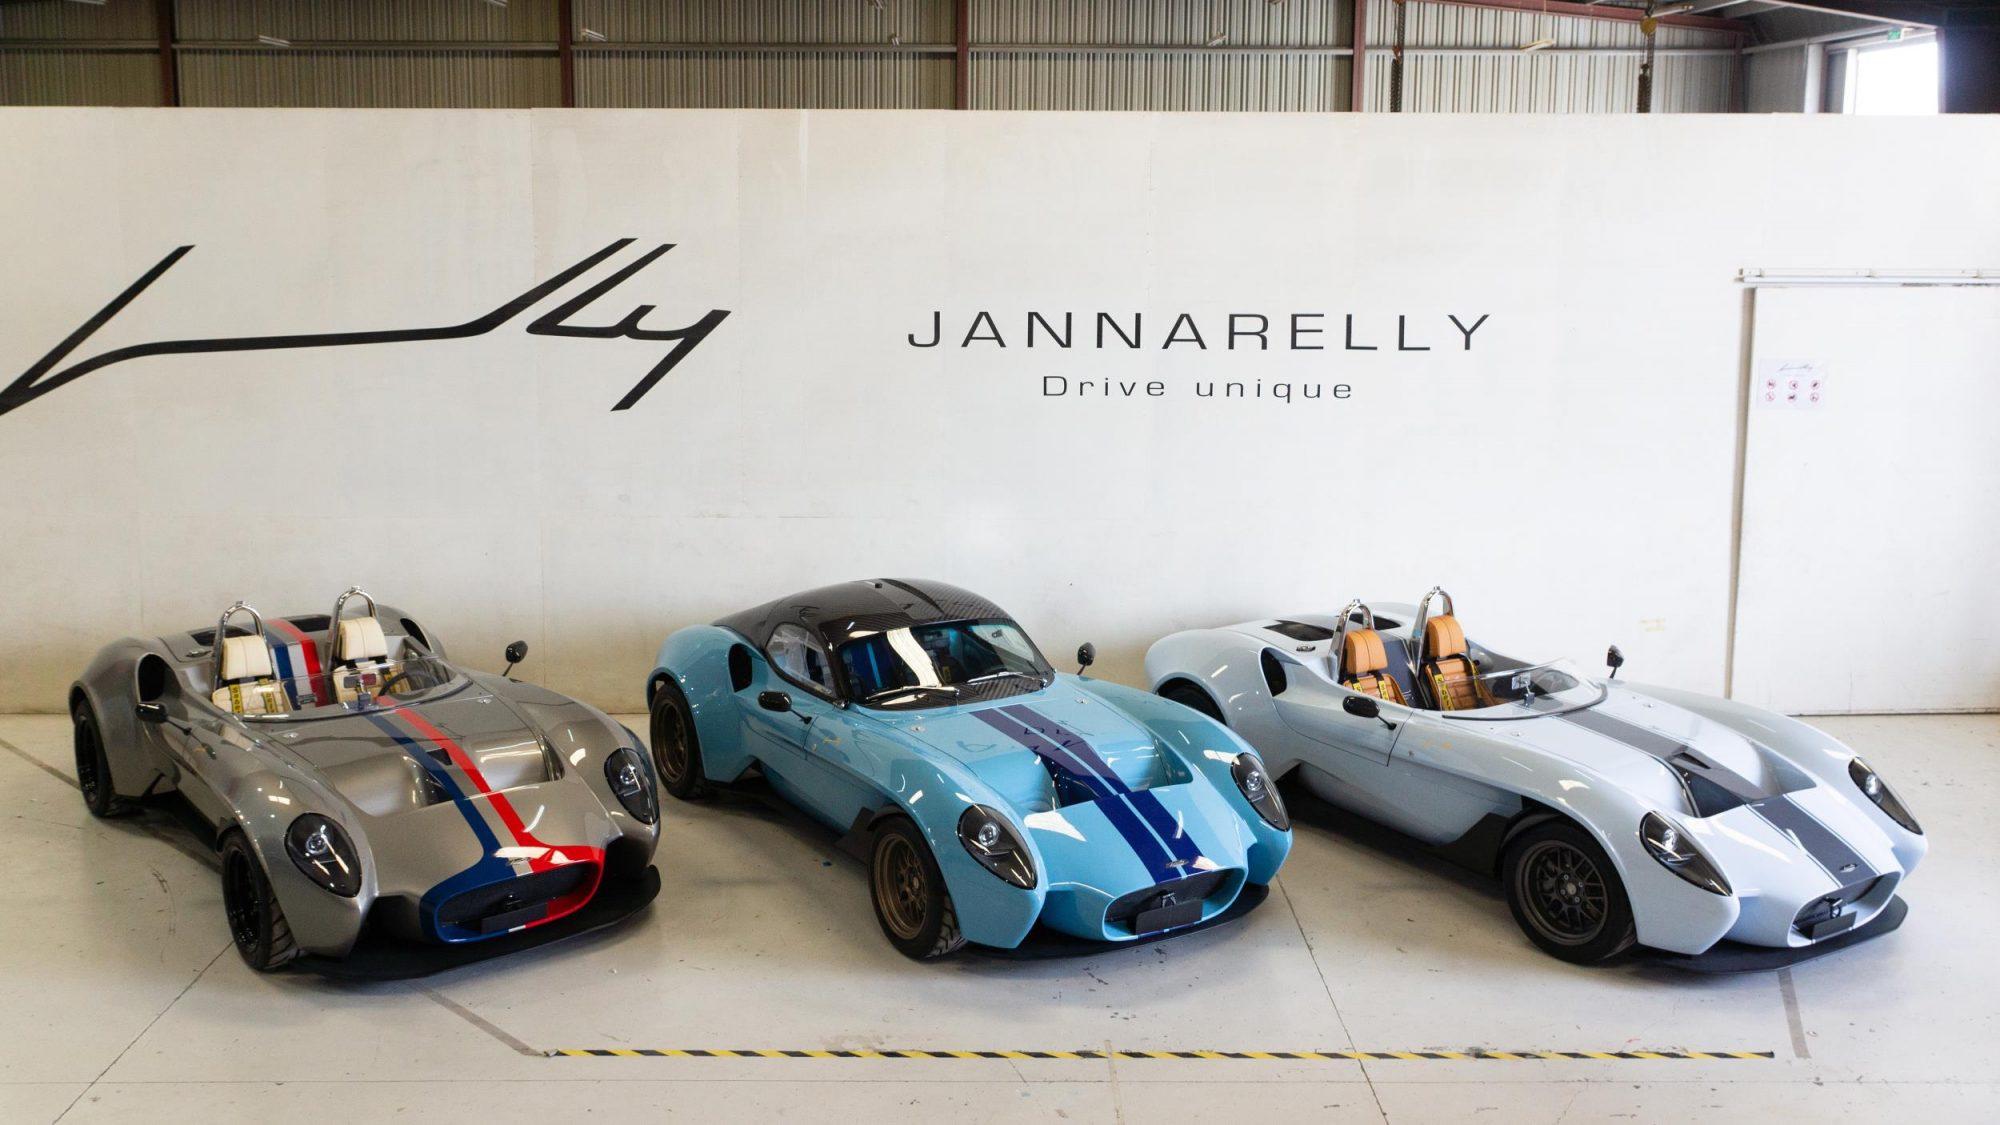 Jannarelly, Jannarelly Design-1, Design-1, Lykan, Lykan Hypersport, Salon Privé